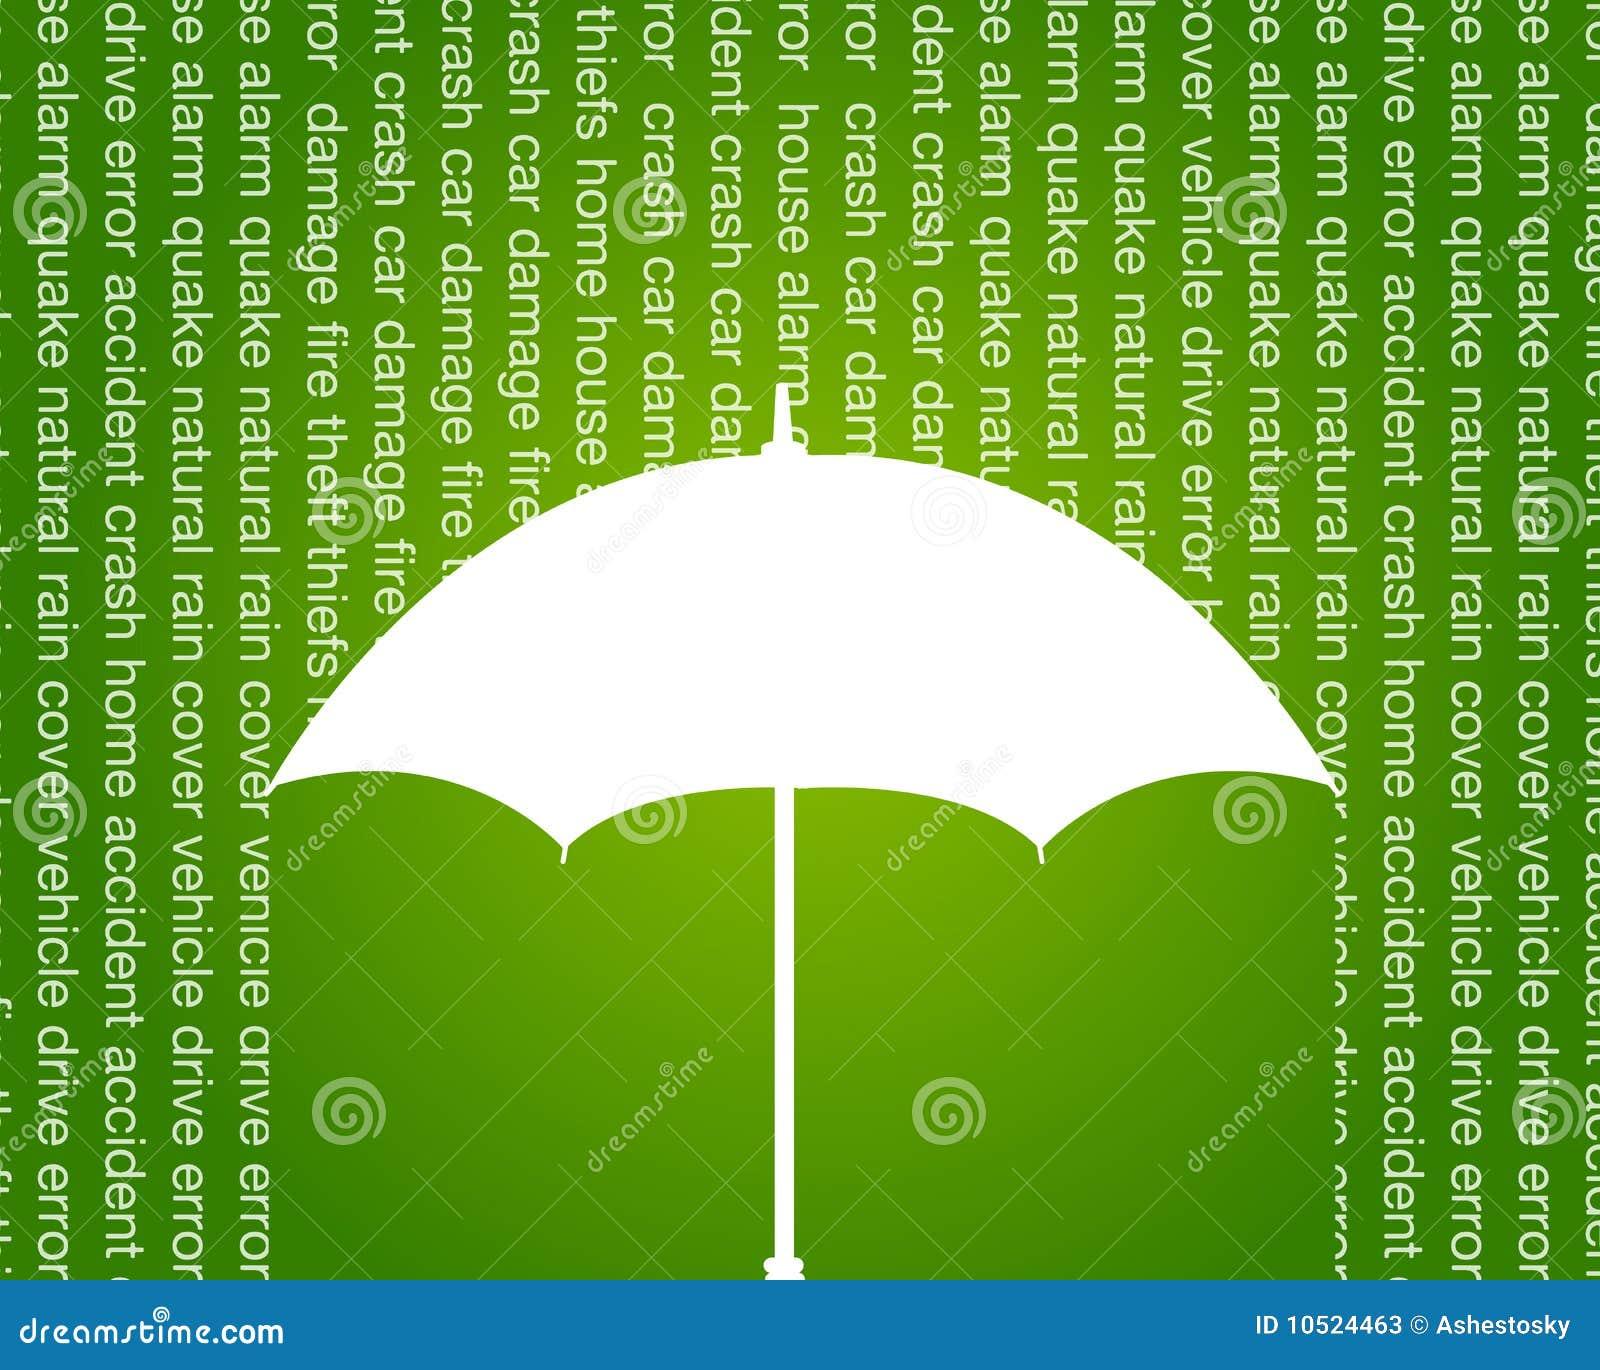 Travelers Insurance Umbrella Commercial